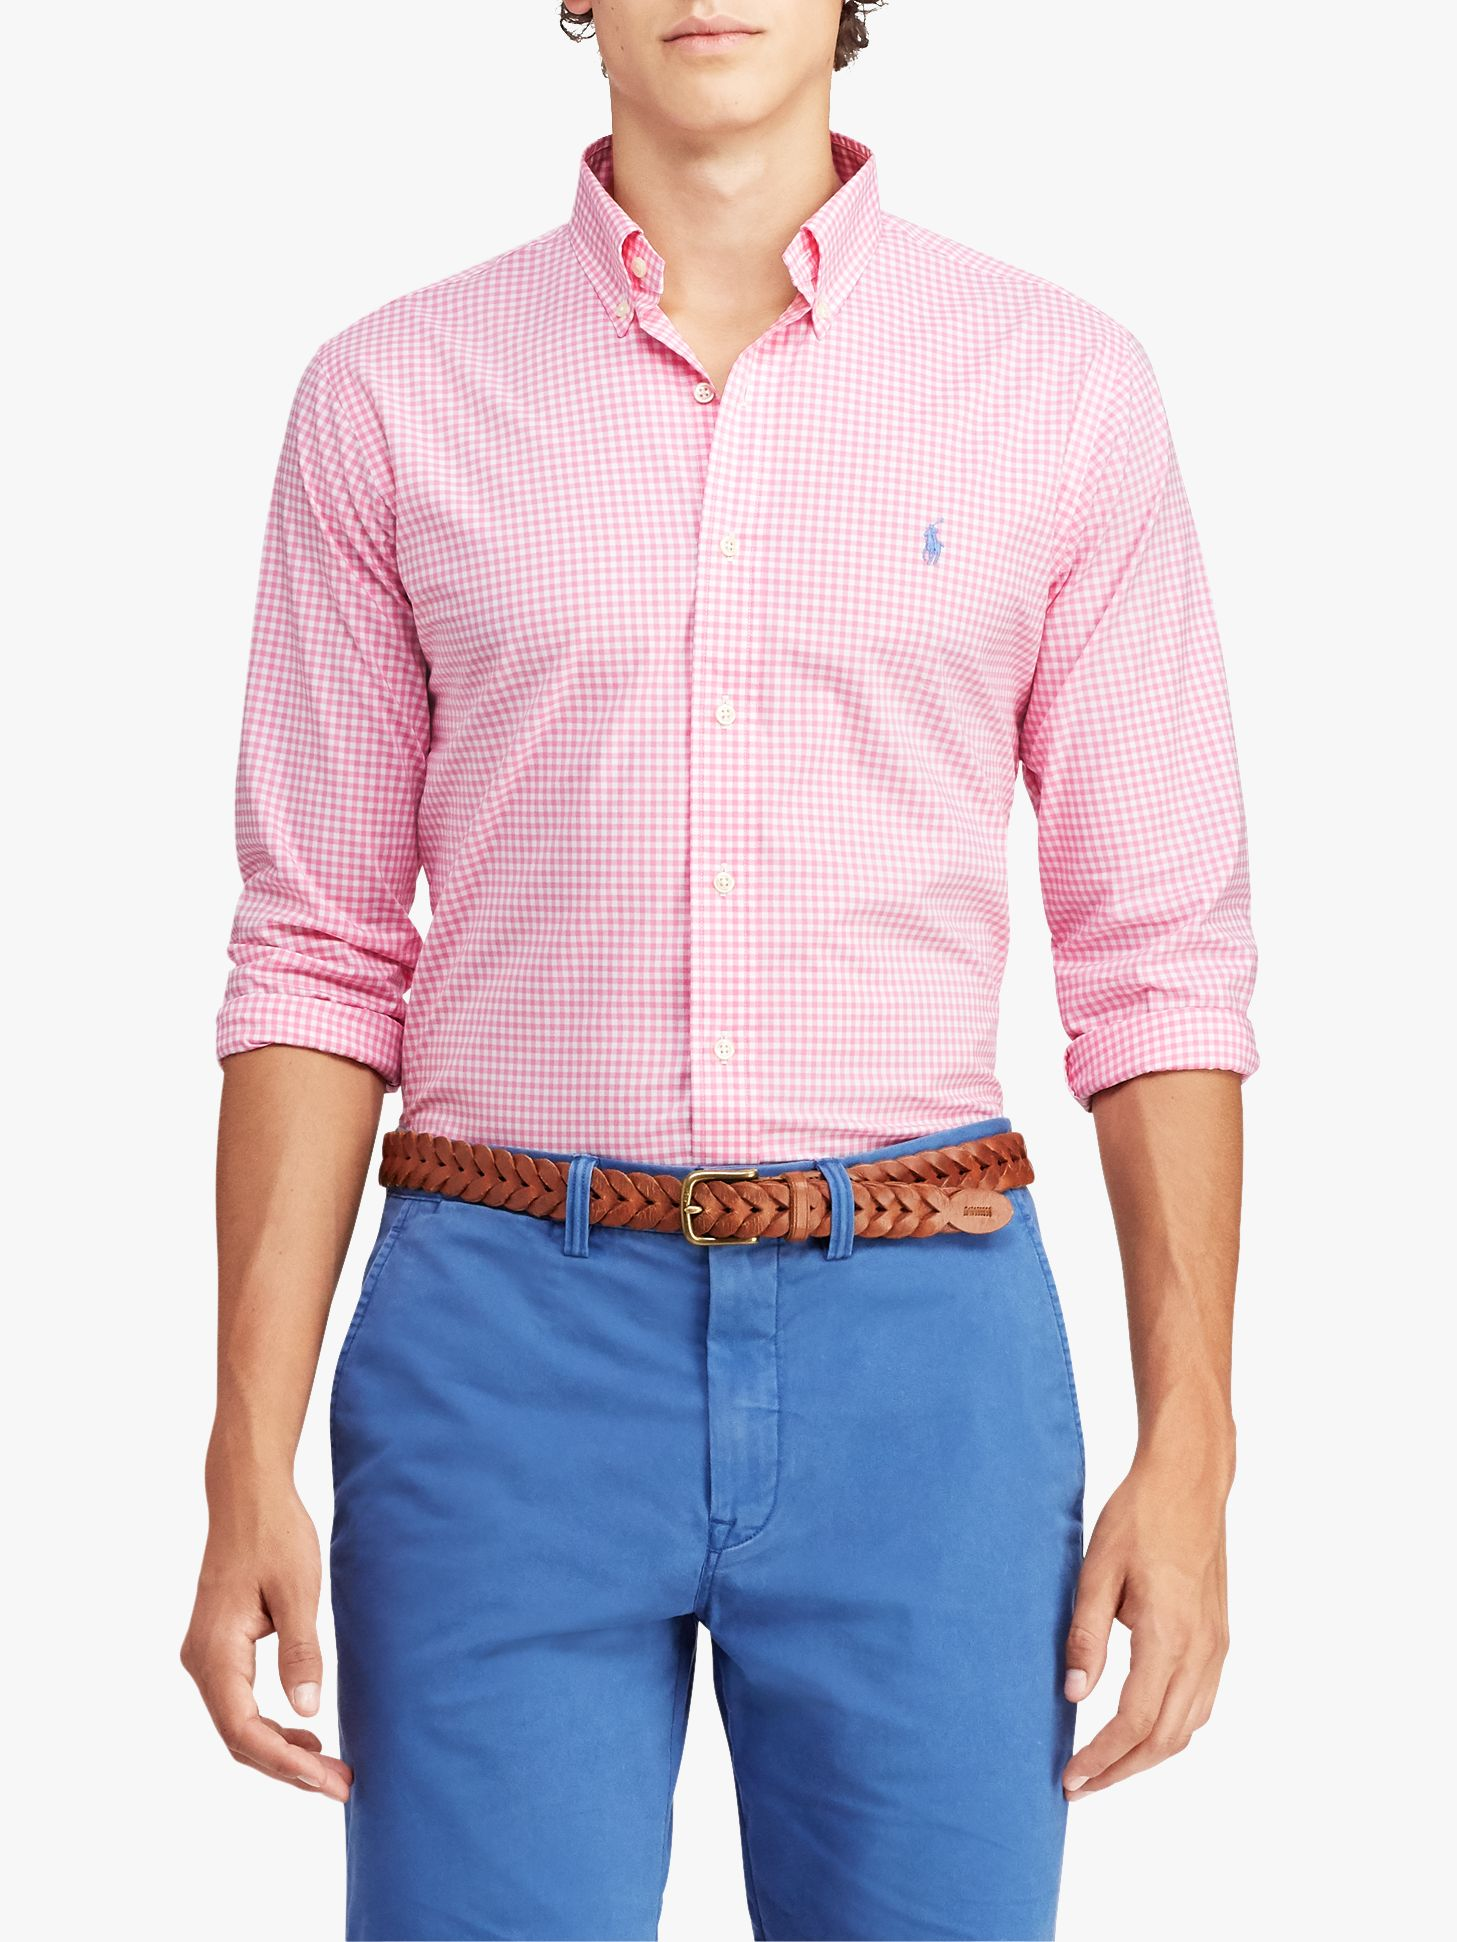 bac6d9c7500b4d Polo Ralph Lauren Classic Fit Gingham Shirt